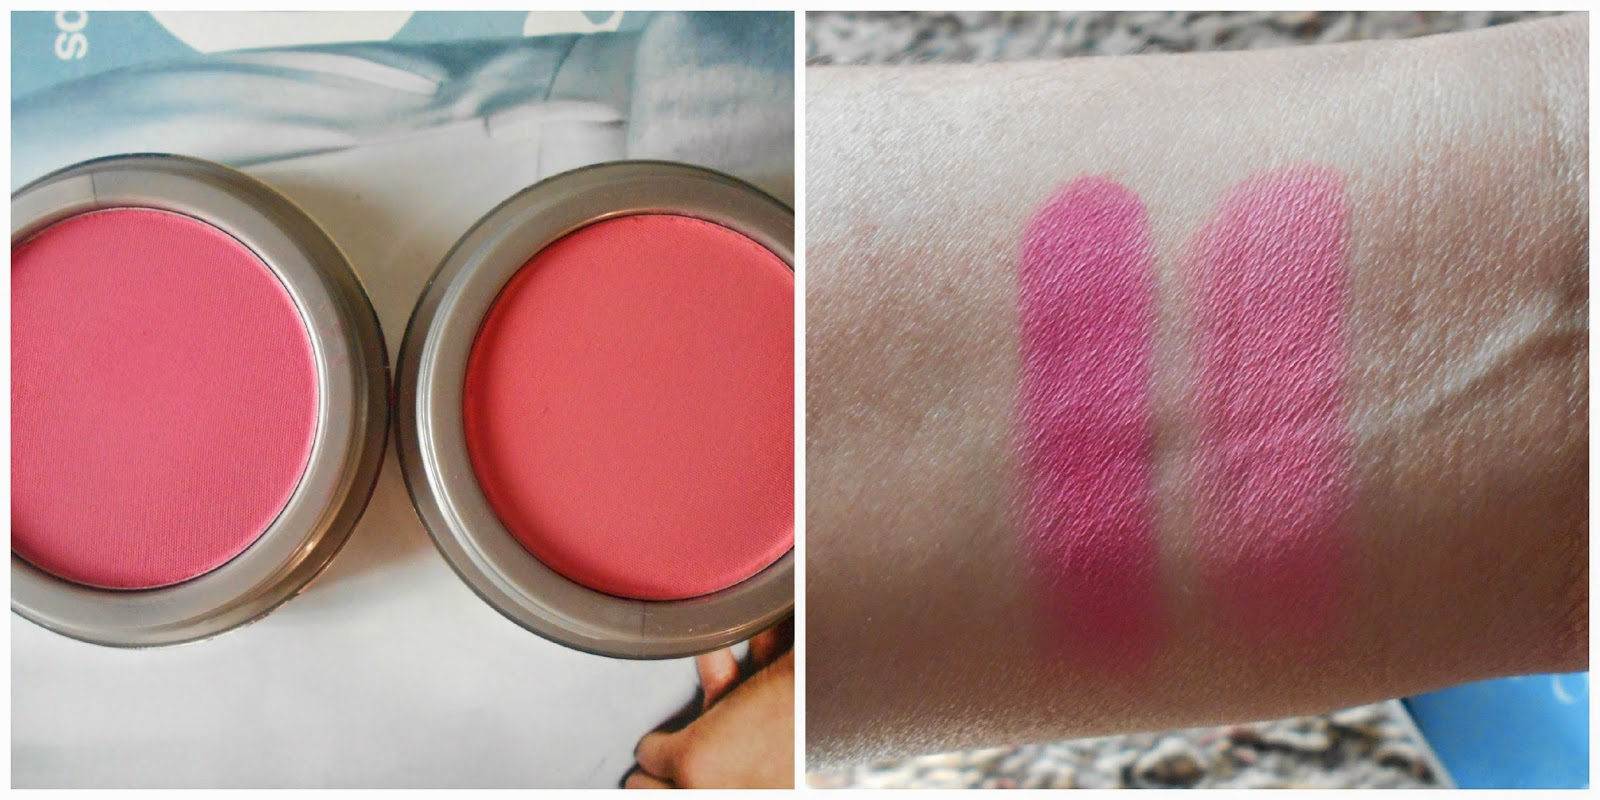 Jordana Cosmetics Powder Blushes